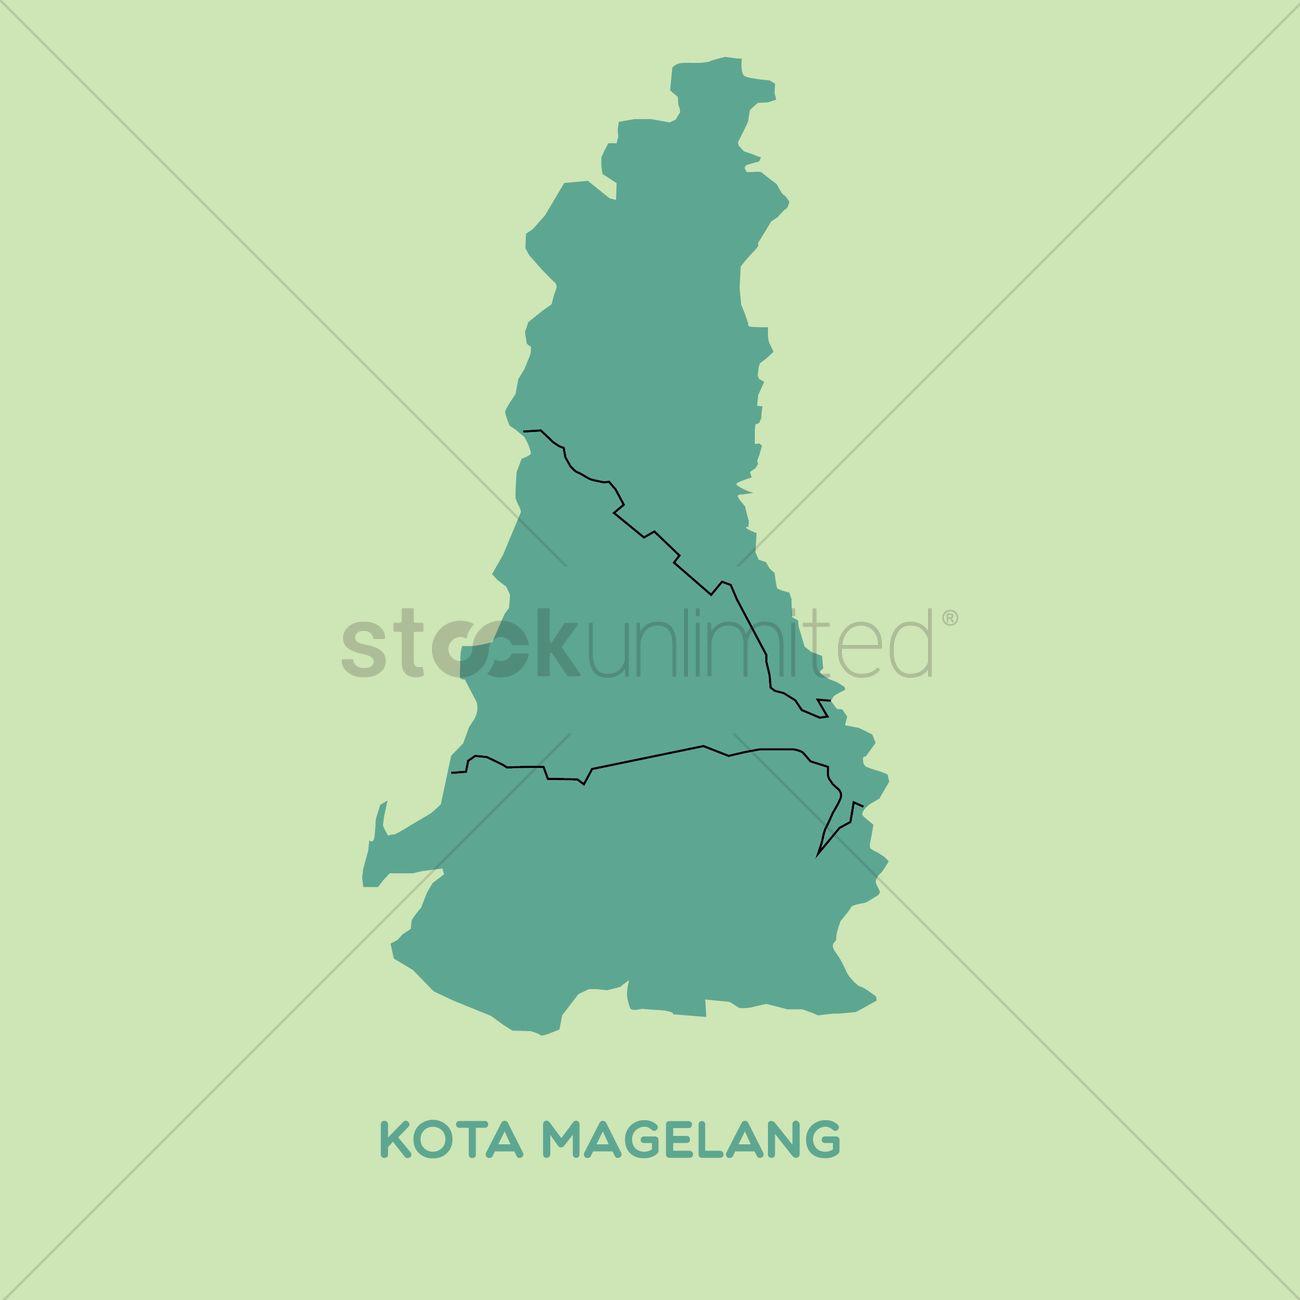 Map Of Kota Magelang Vector Image 1480561 Stockunlimited